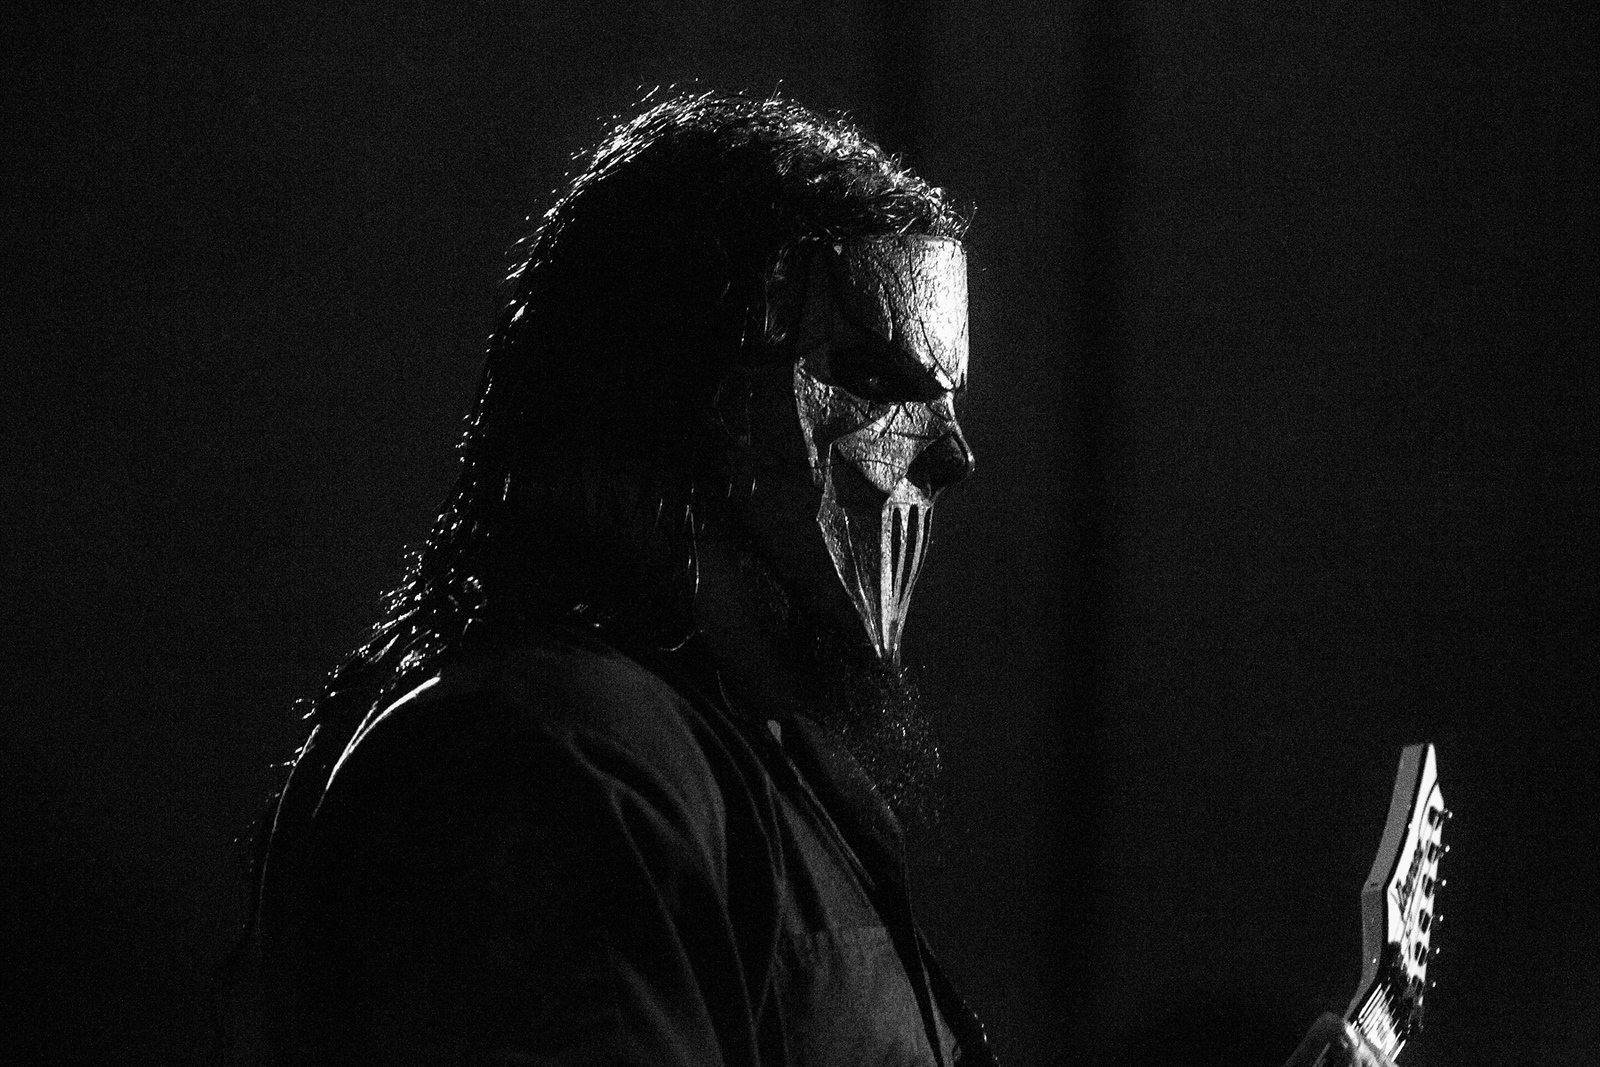 Mick Thomson of Slipknot by Adam Elmakias